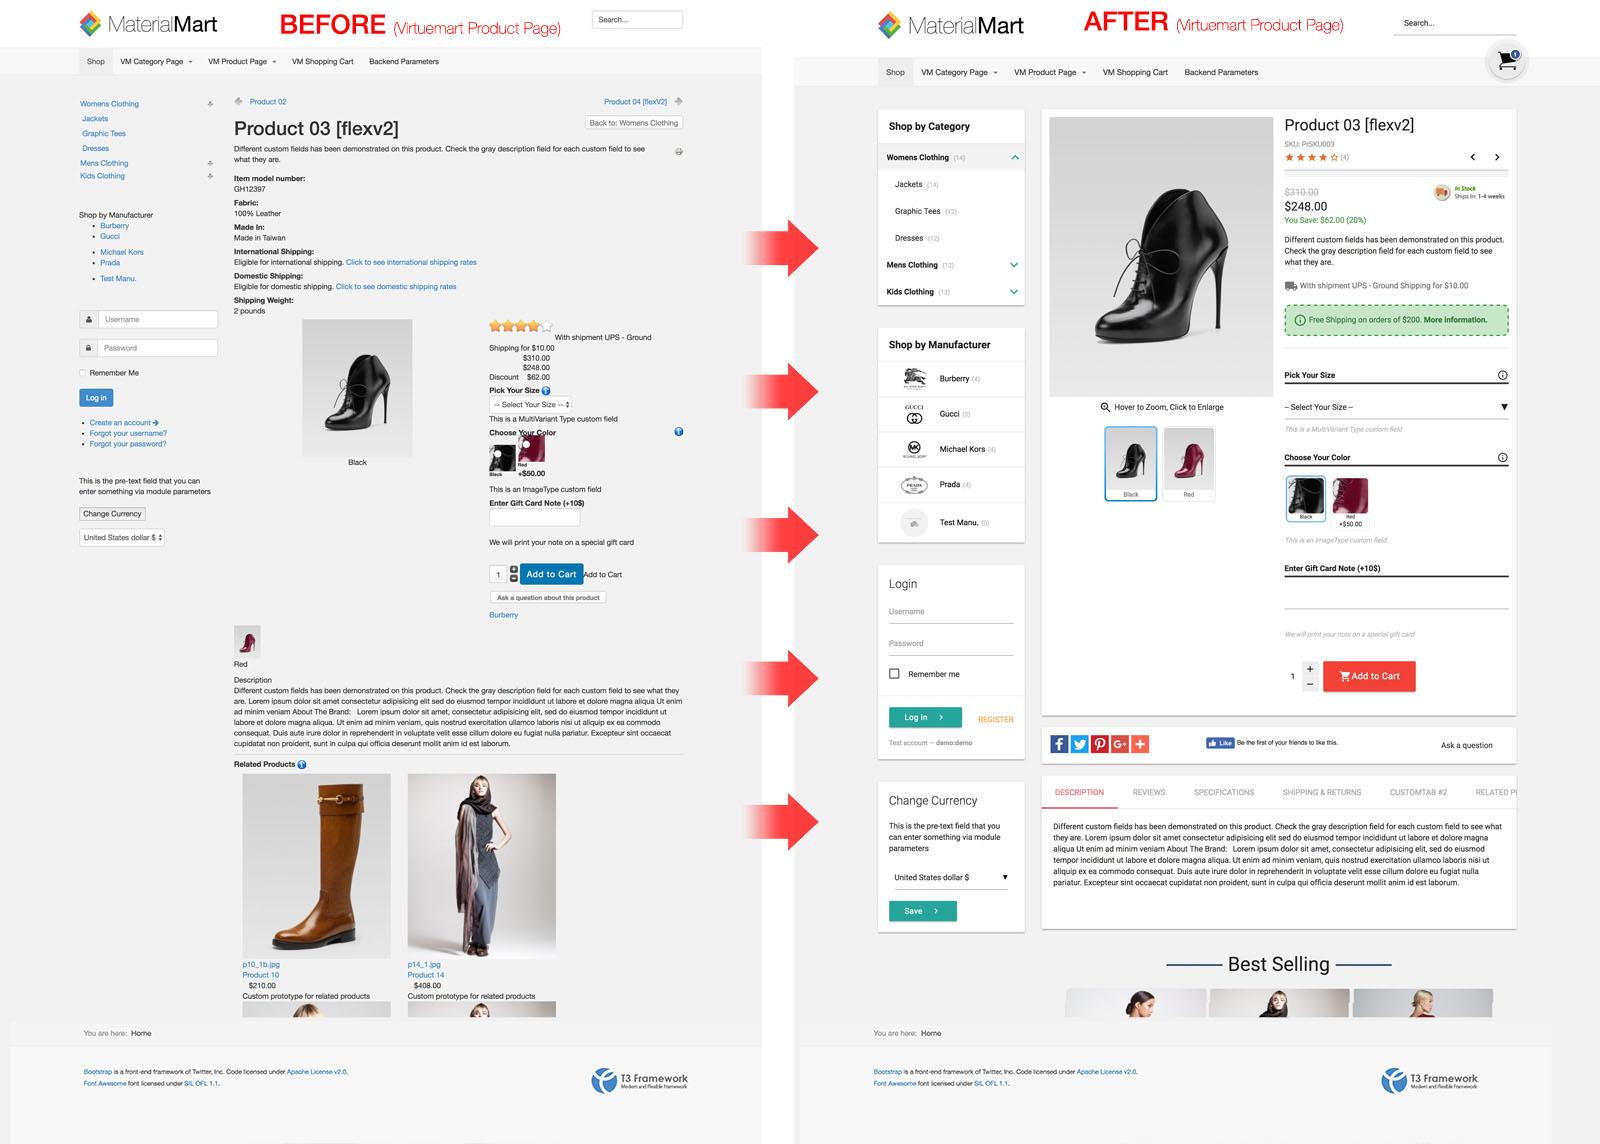 Material Design Virtuemart 3 Template - MaterialMart